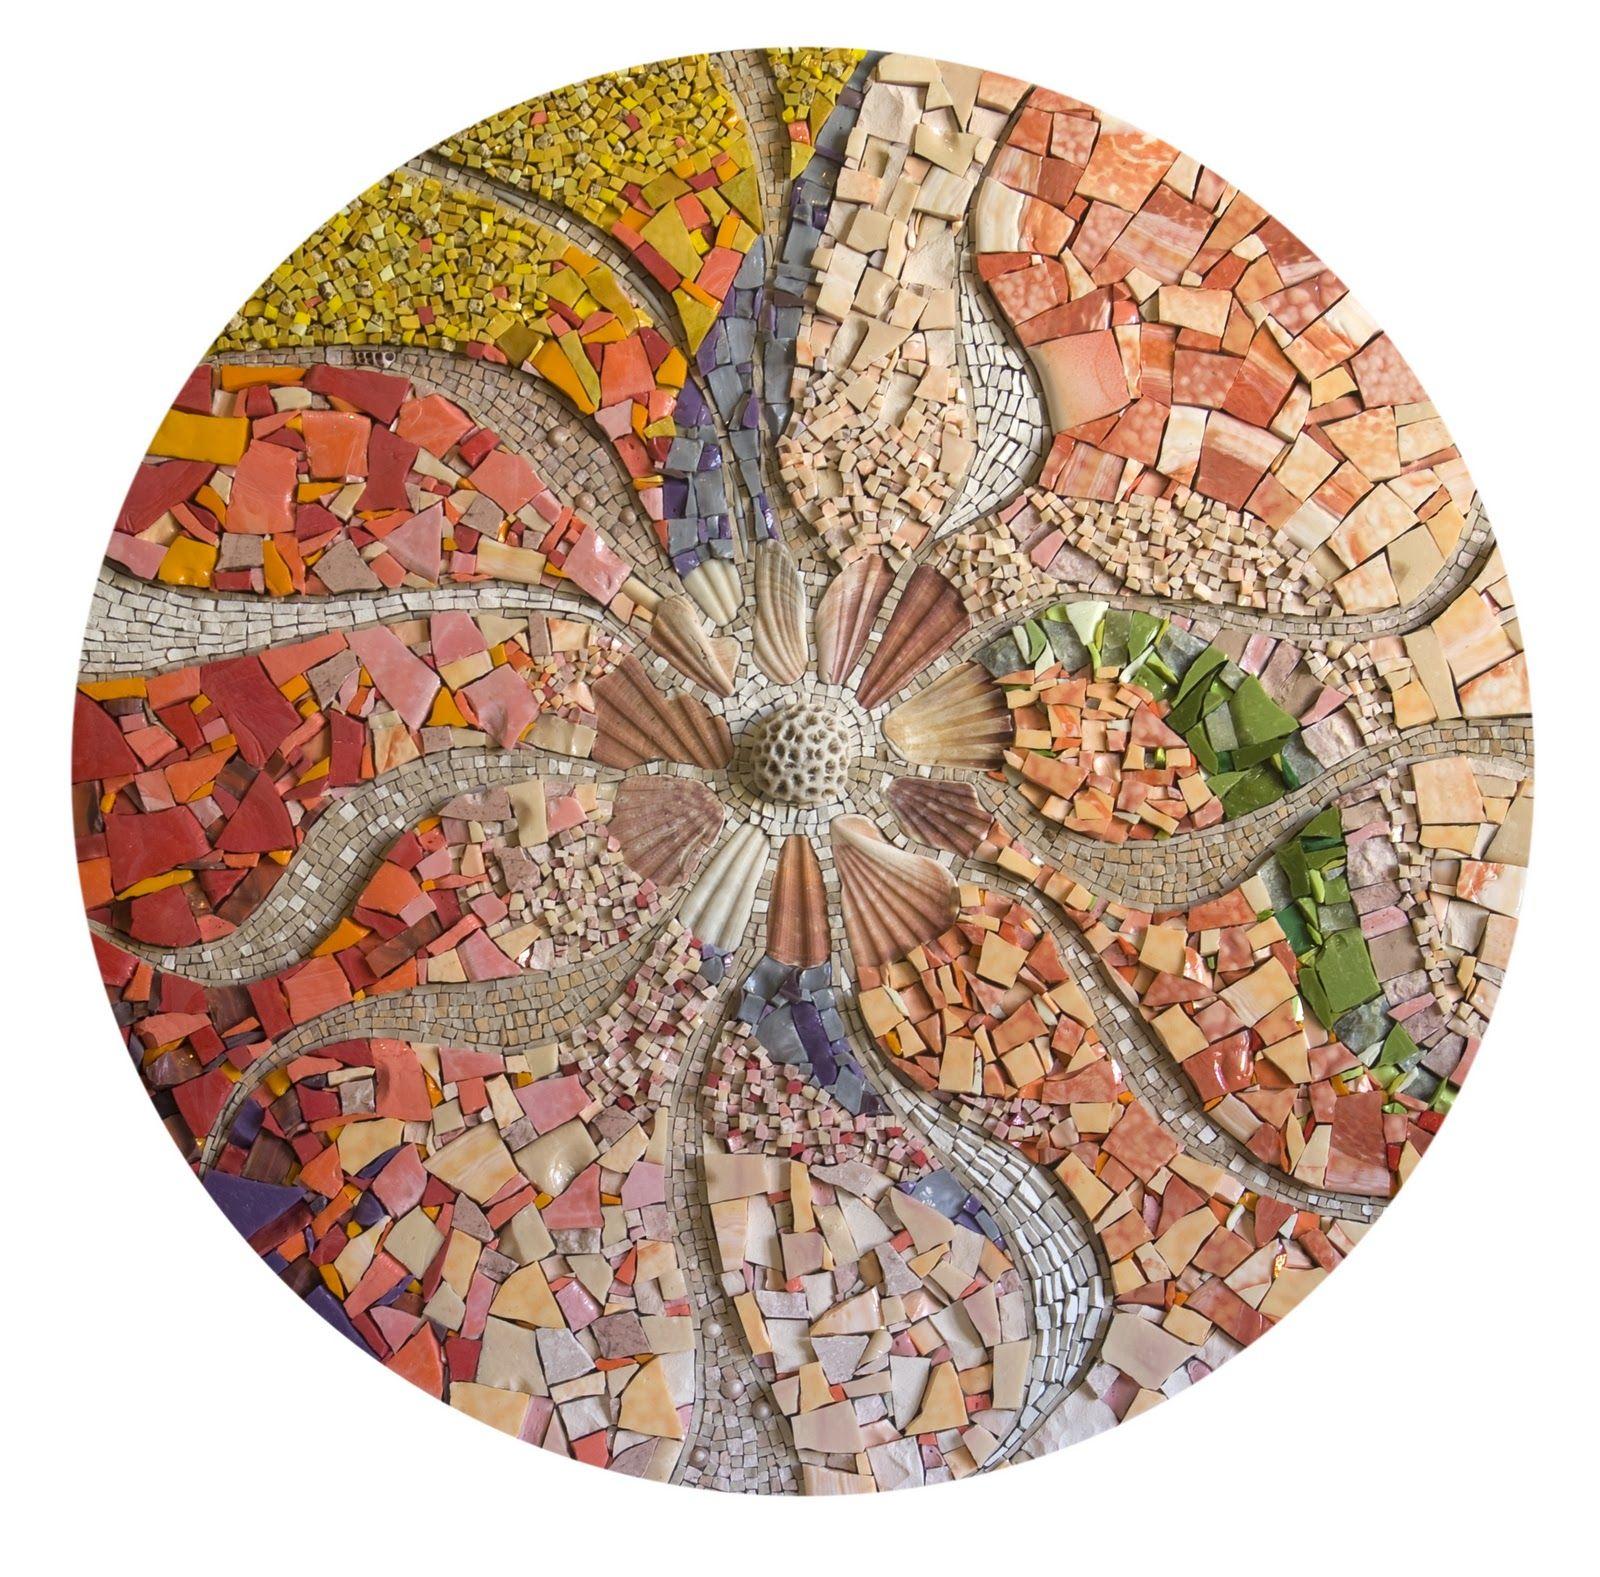 antonella zorzi mosaics mosaik pinterest mosaik. Black Bedroom Furniture Sets. Home Design Ideas